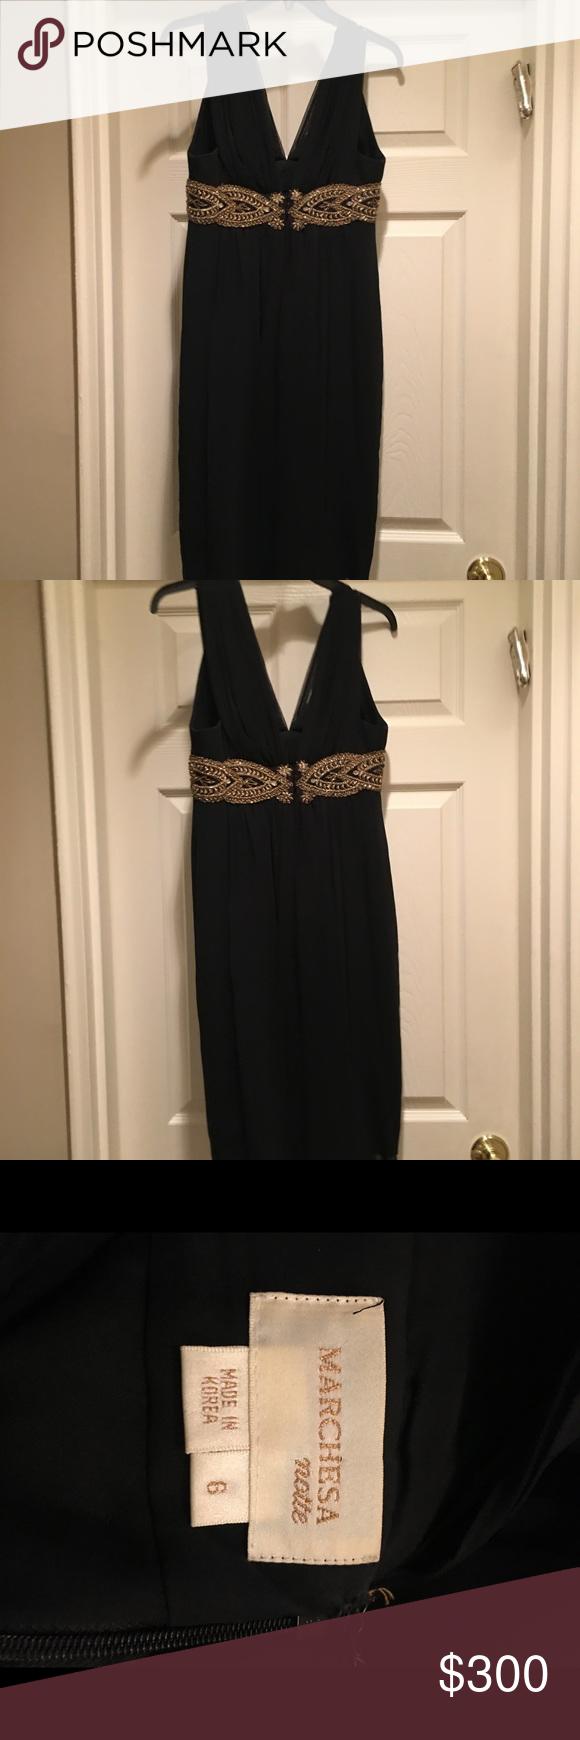 Marchesa Black Evening Dress With Gold Trim Black Evening Dresses Marchesa Dress Dresses